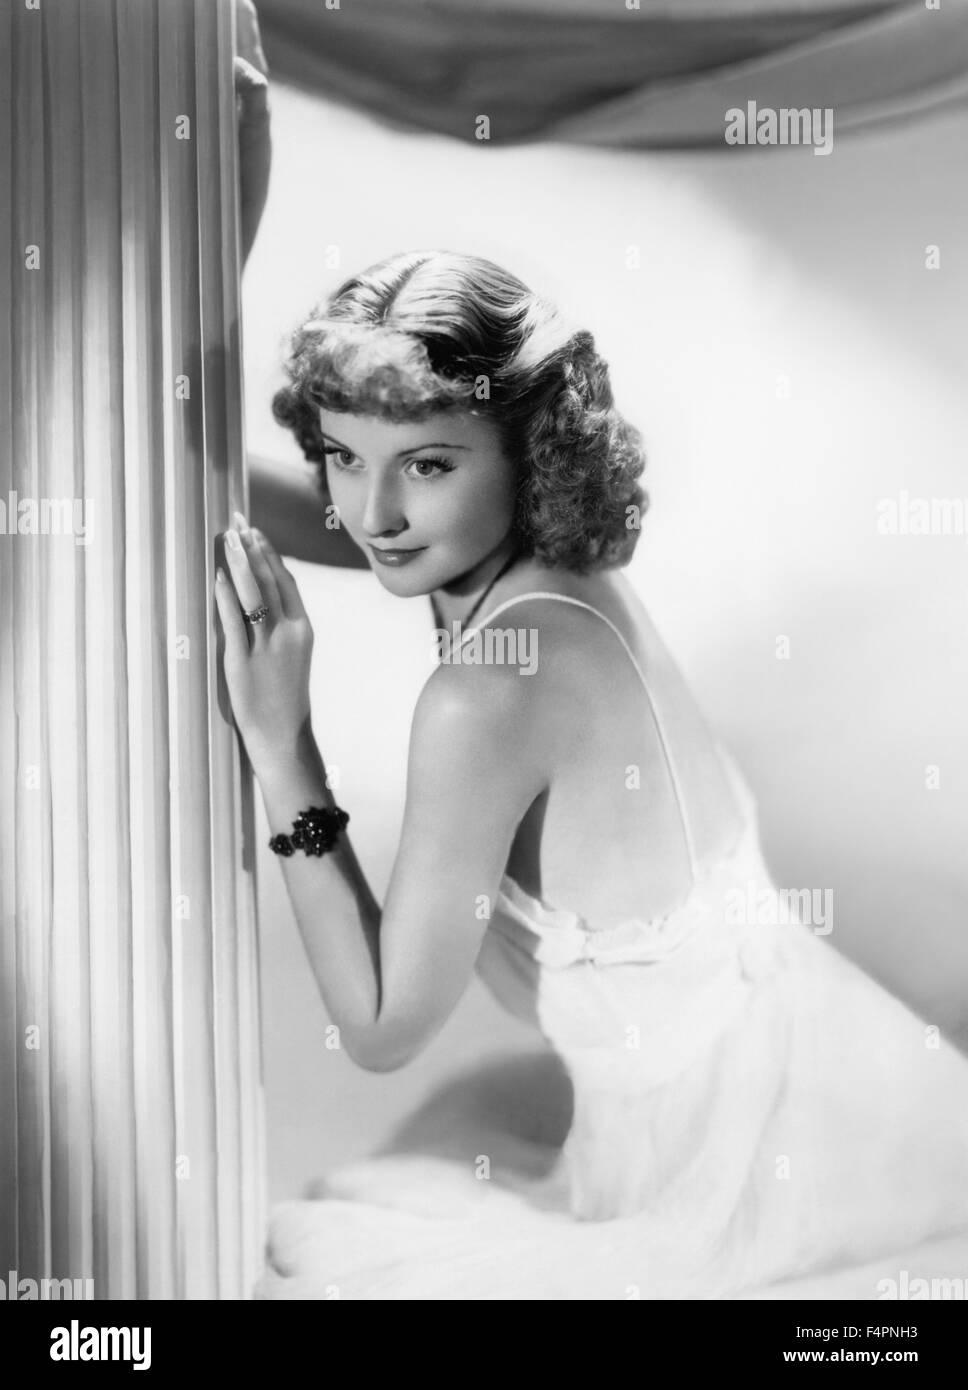 Barbara Stanwyck in the 30's - Stock Image